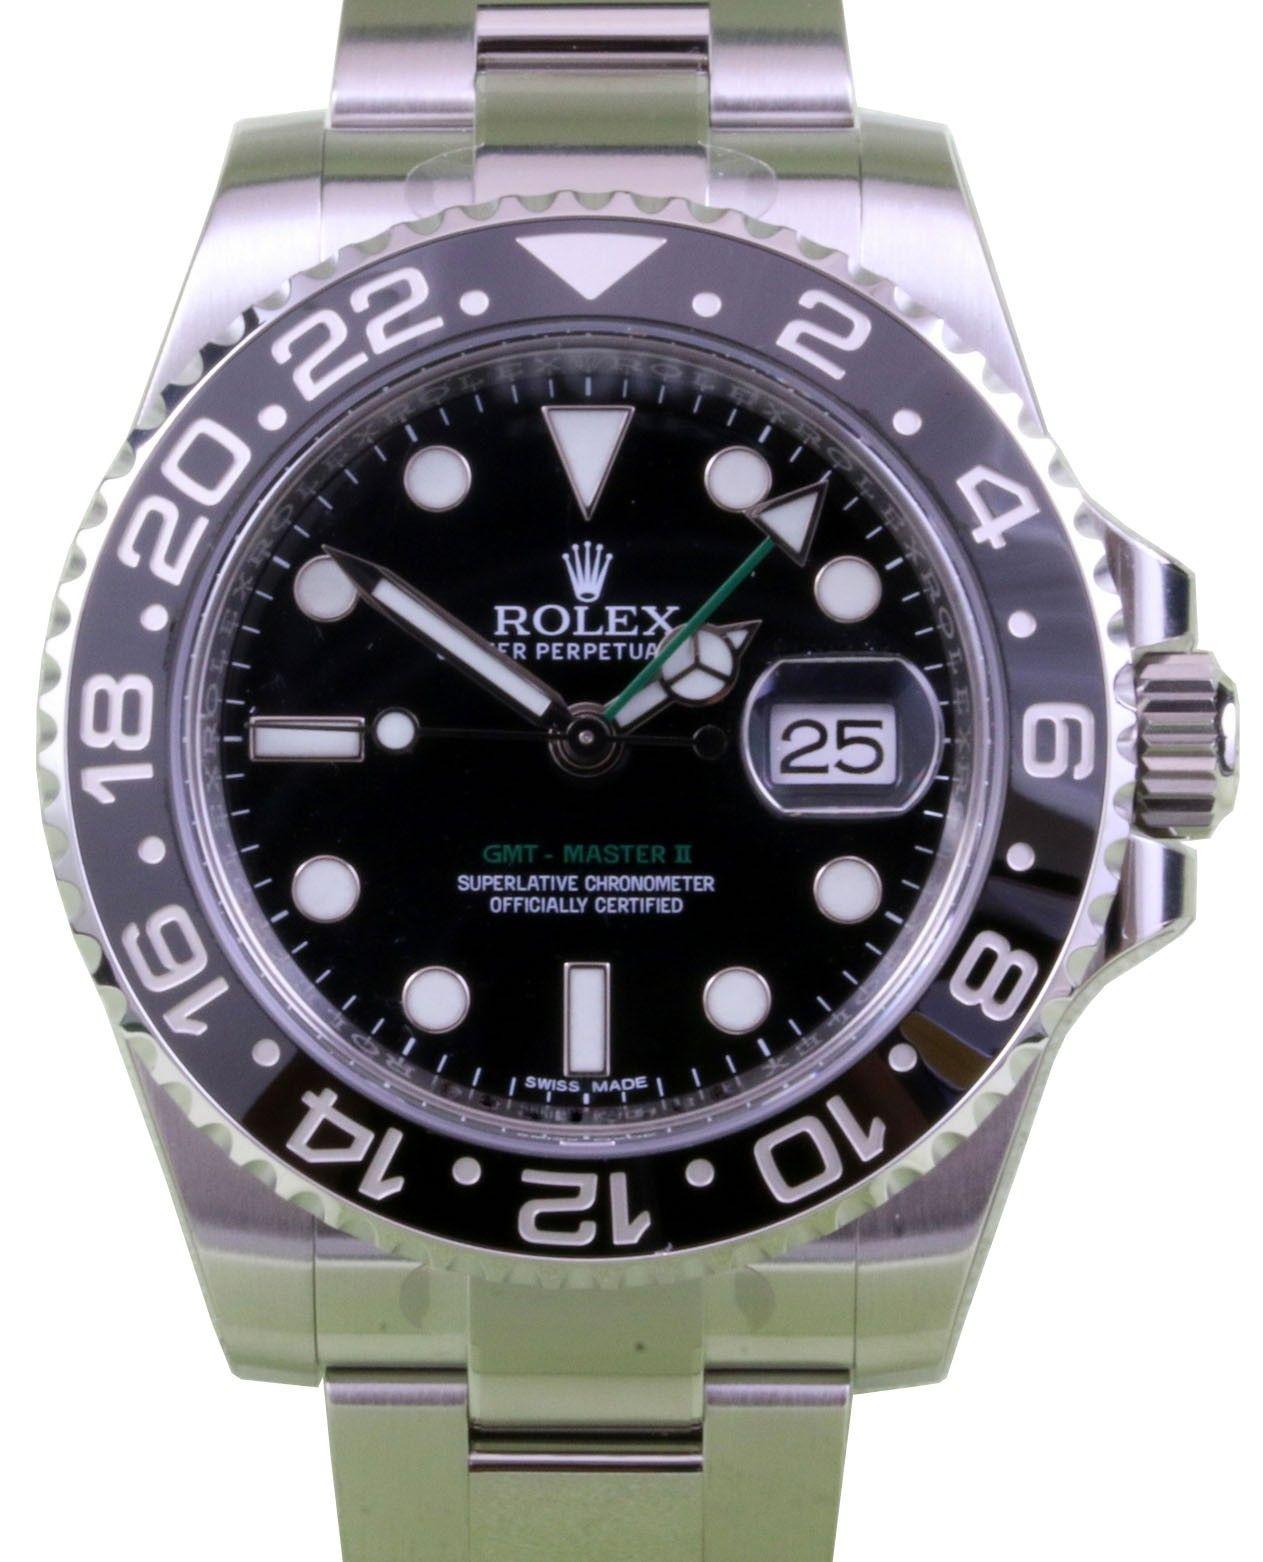 Rolex 116710 Gmt Master Ii Black For Sale Rolex Gmt Master Ii Rolex Rolex Gmt